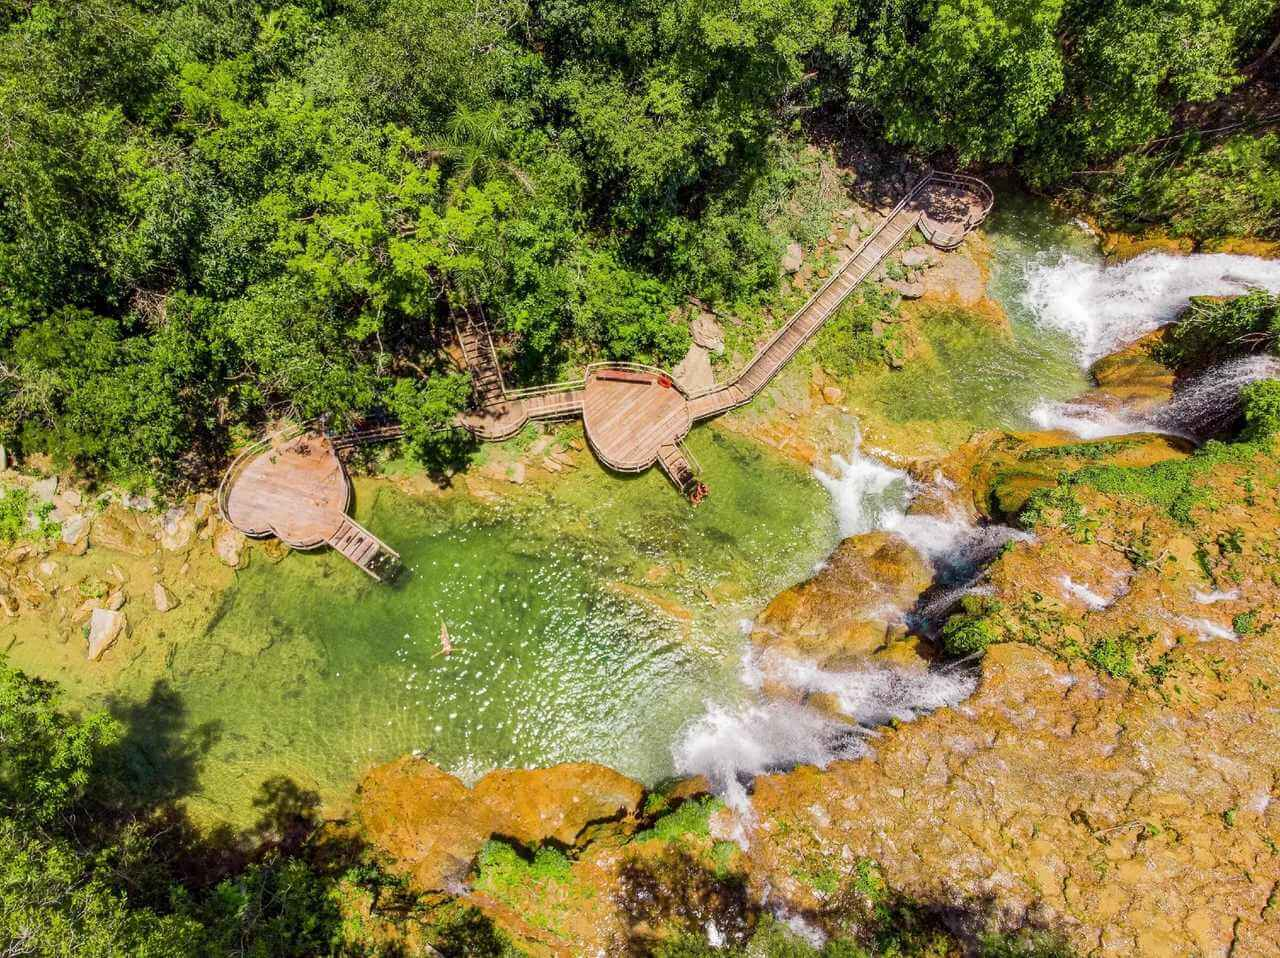 parque-das-cachoeiras-3